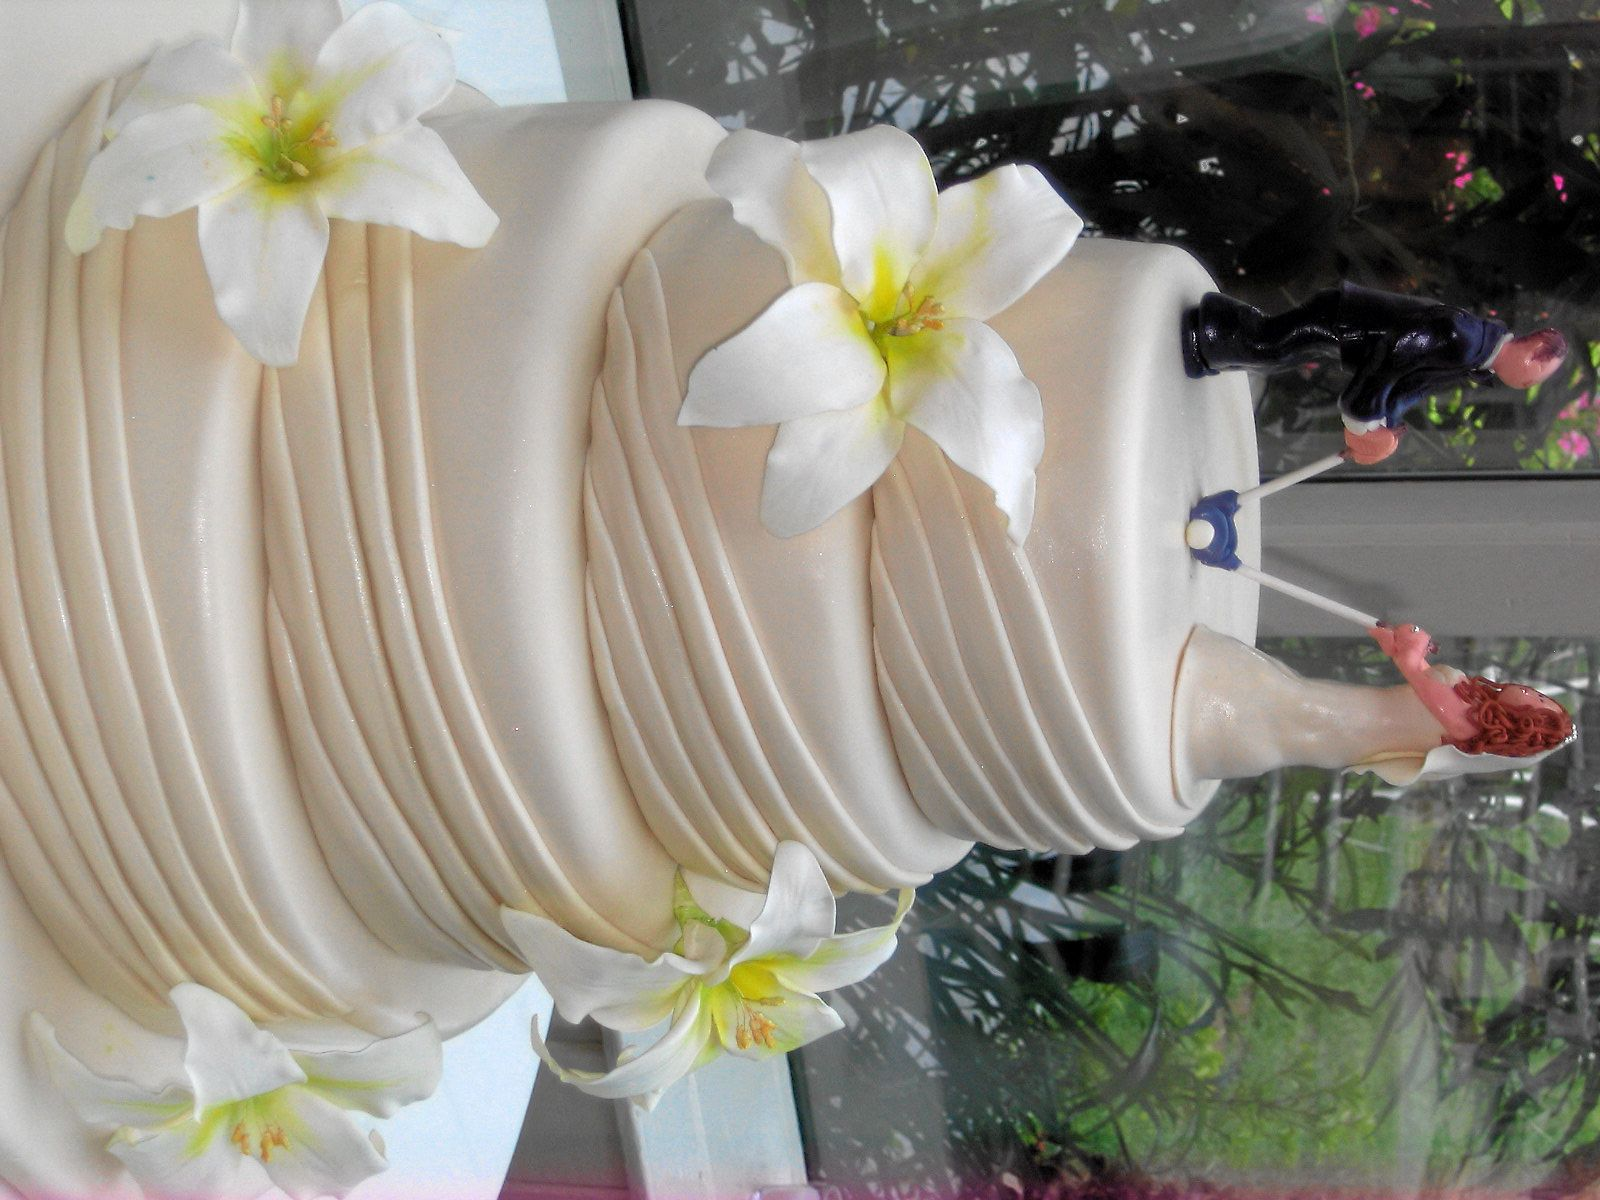 Wedding Cake Gallery Custom Flowers And Weddings Cakes Pinterest - Wedding Cakes Gallery